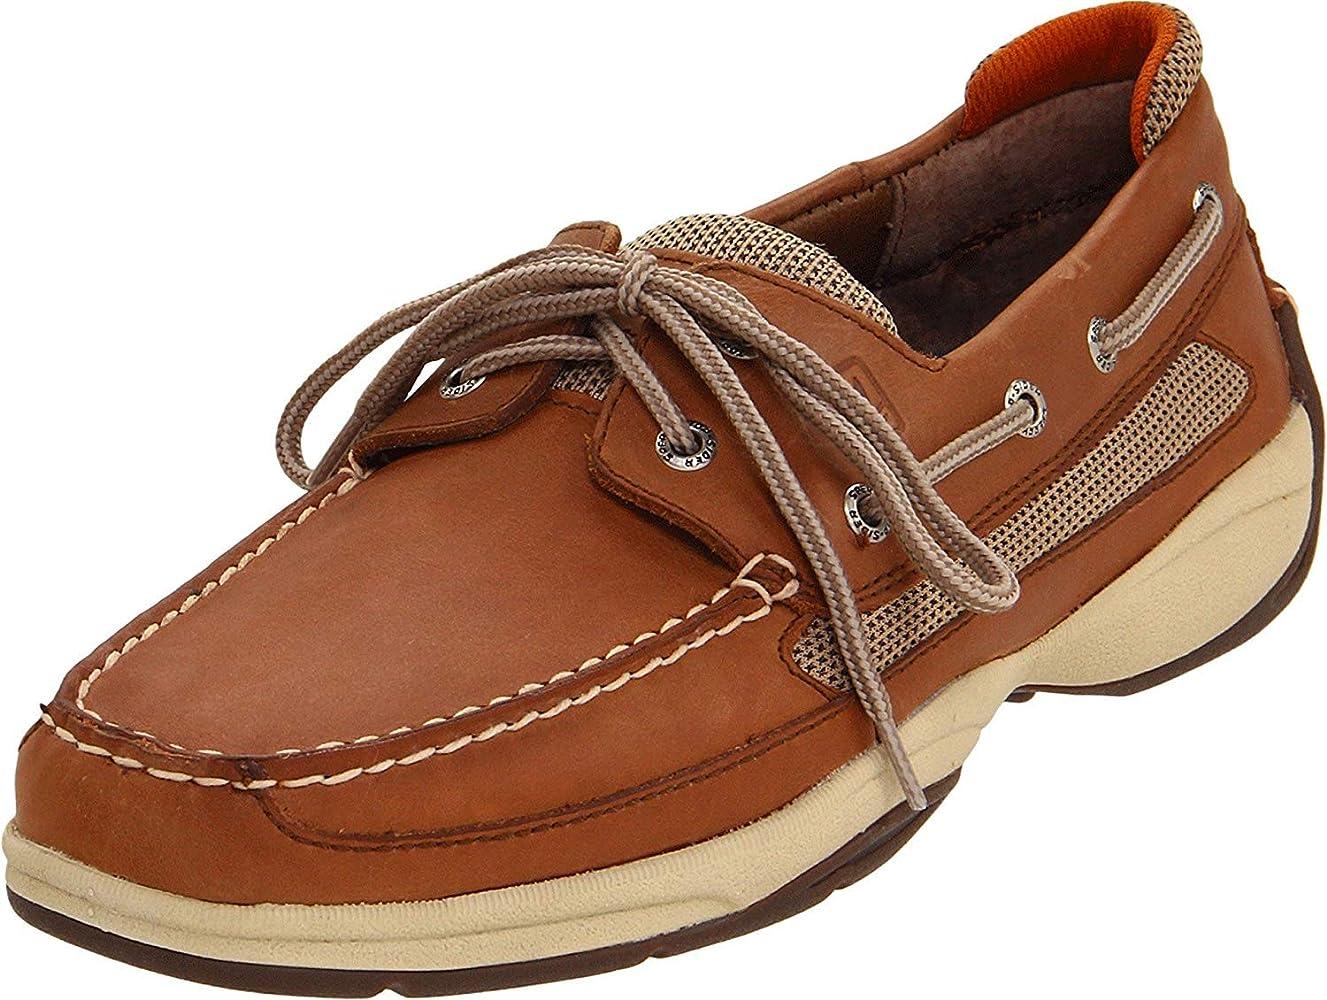 2-Eye Boat Shoe, Dark Tan/Orange